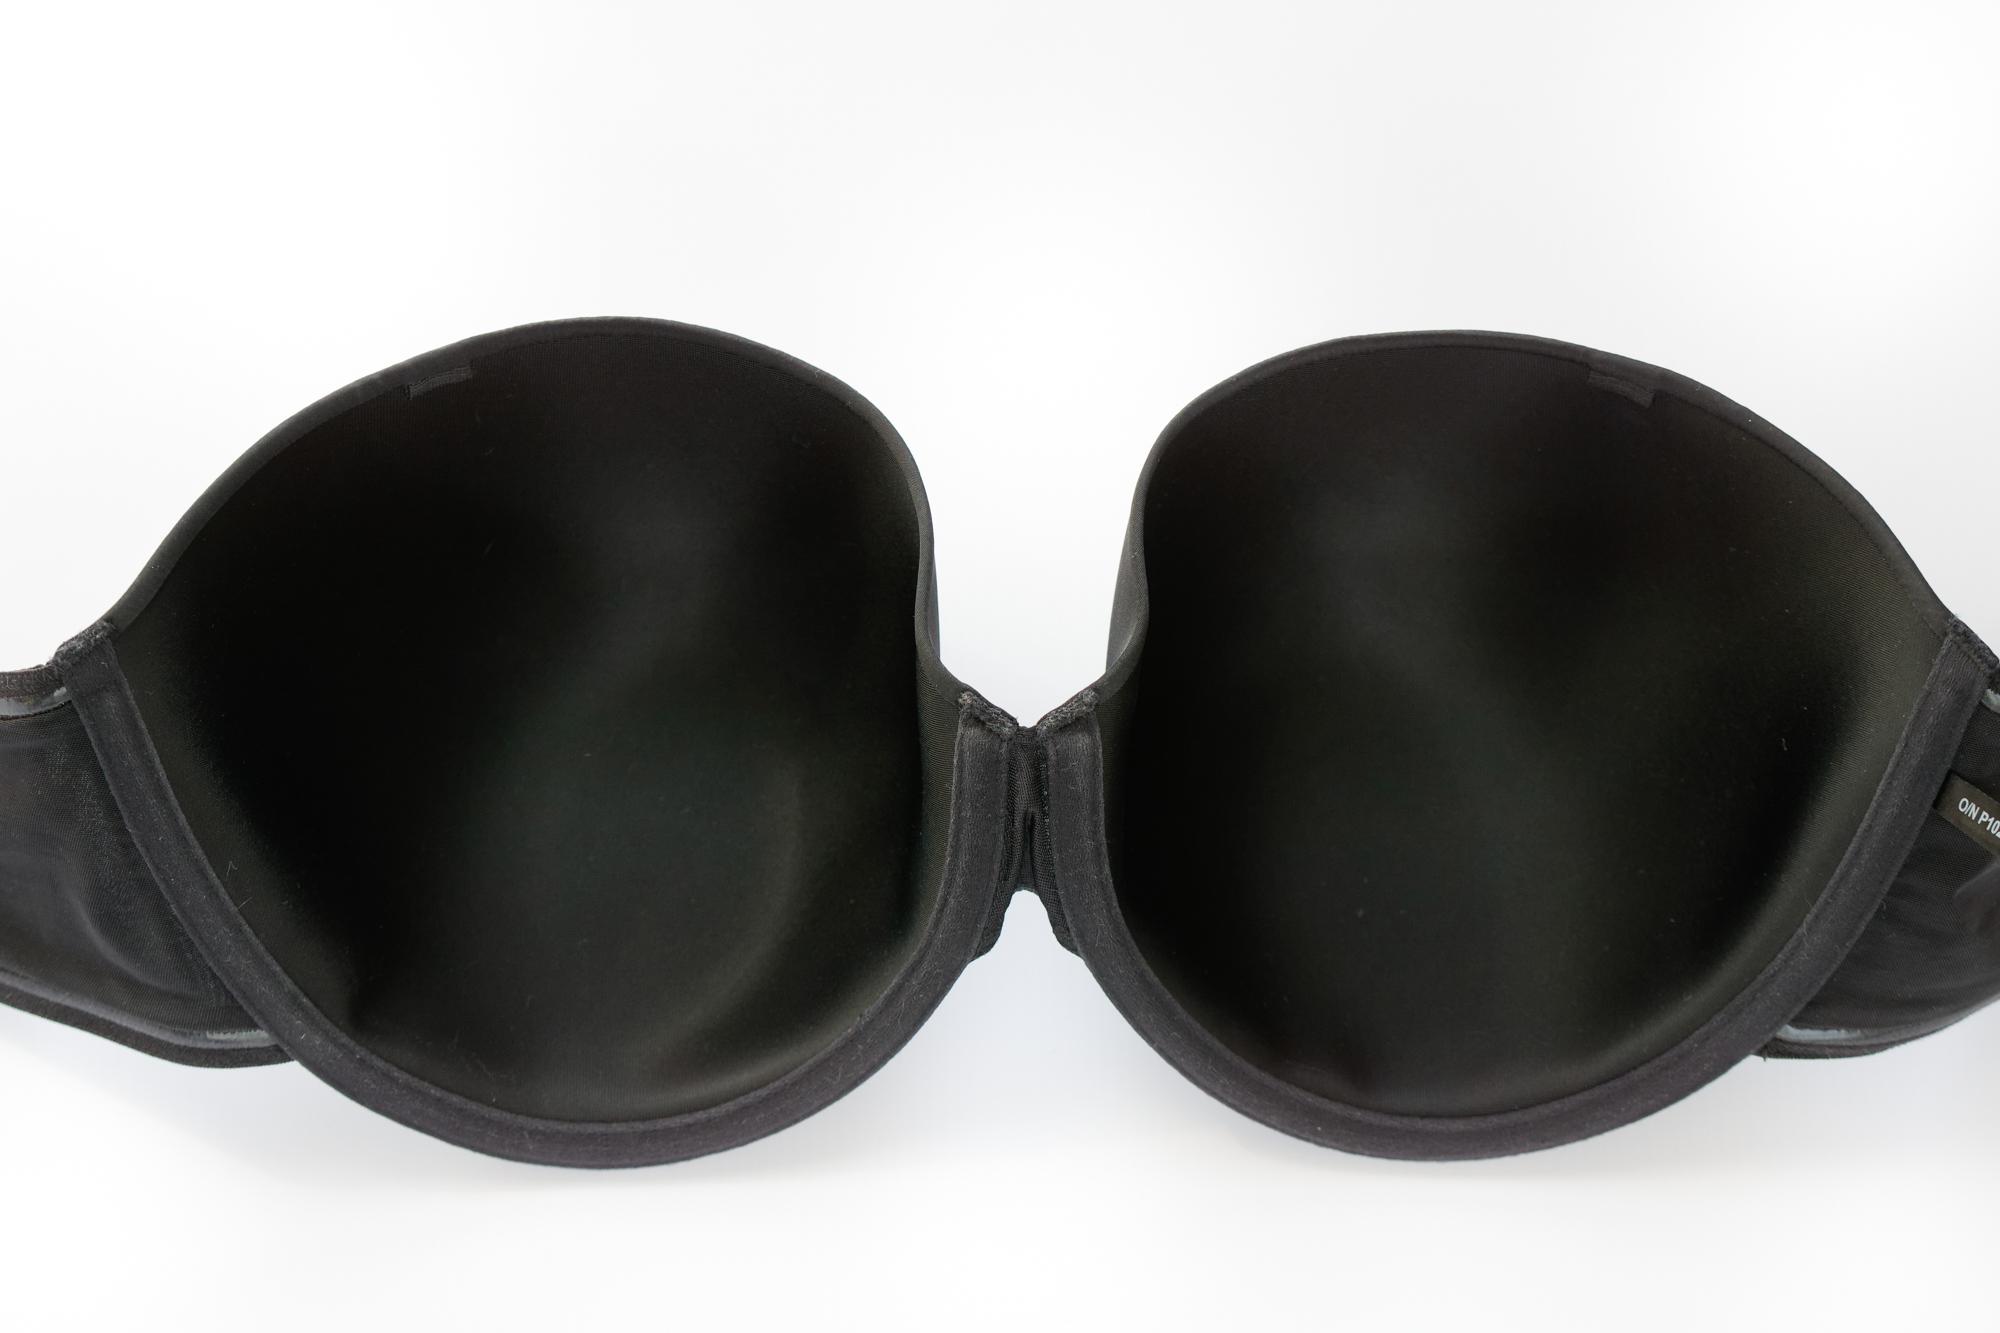 Biustonosz Panache Porcelain Elan moulded strapless czarny